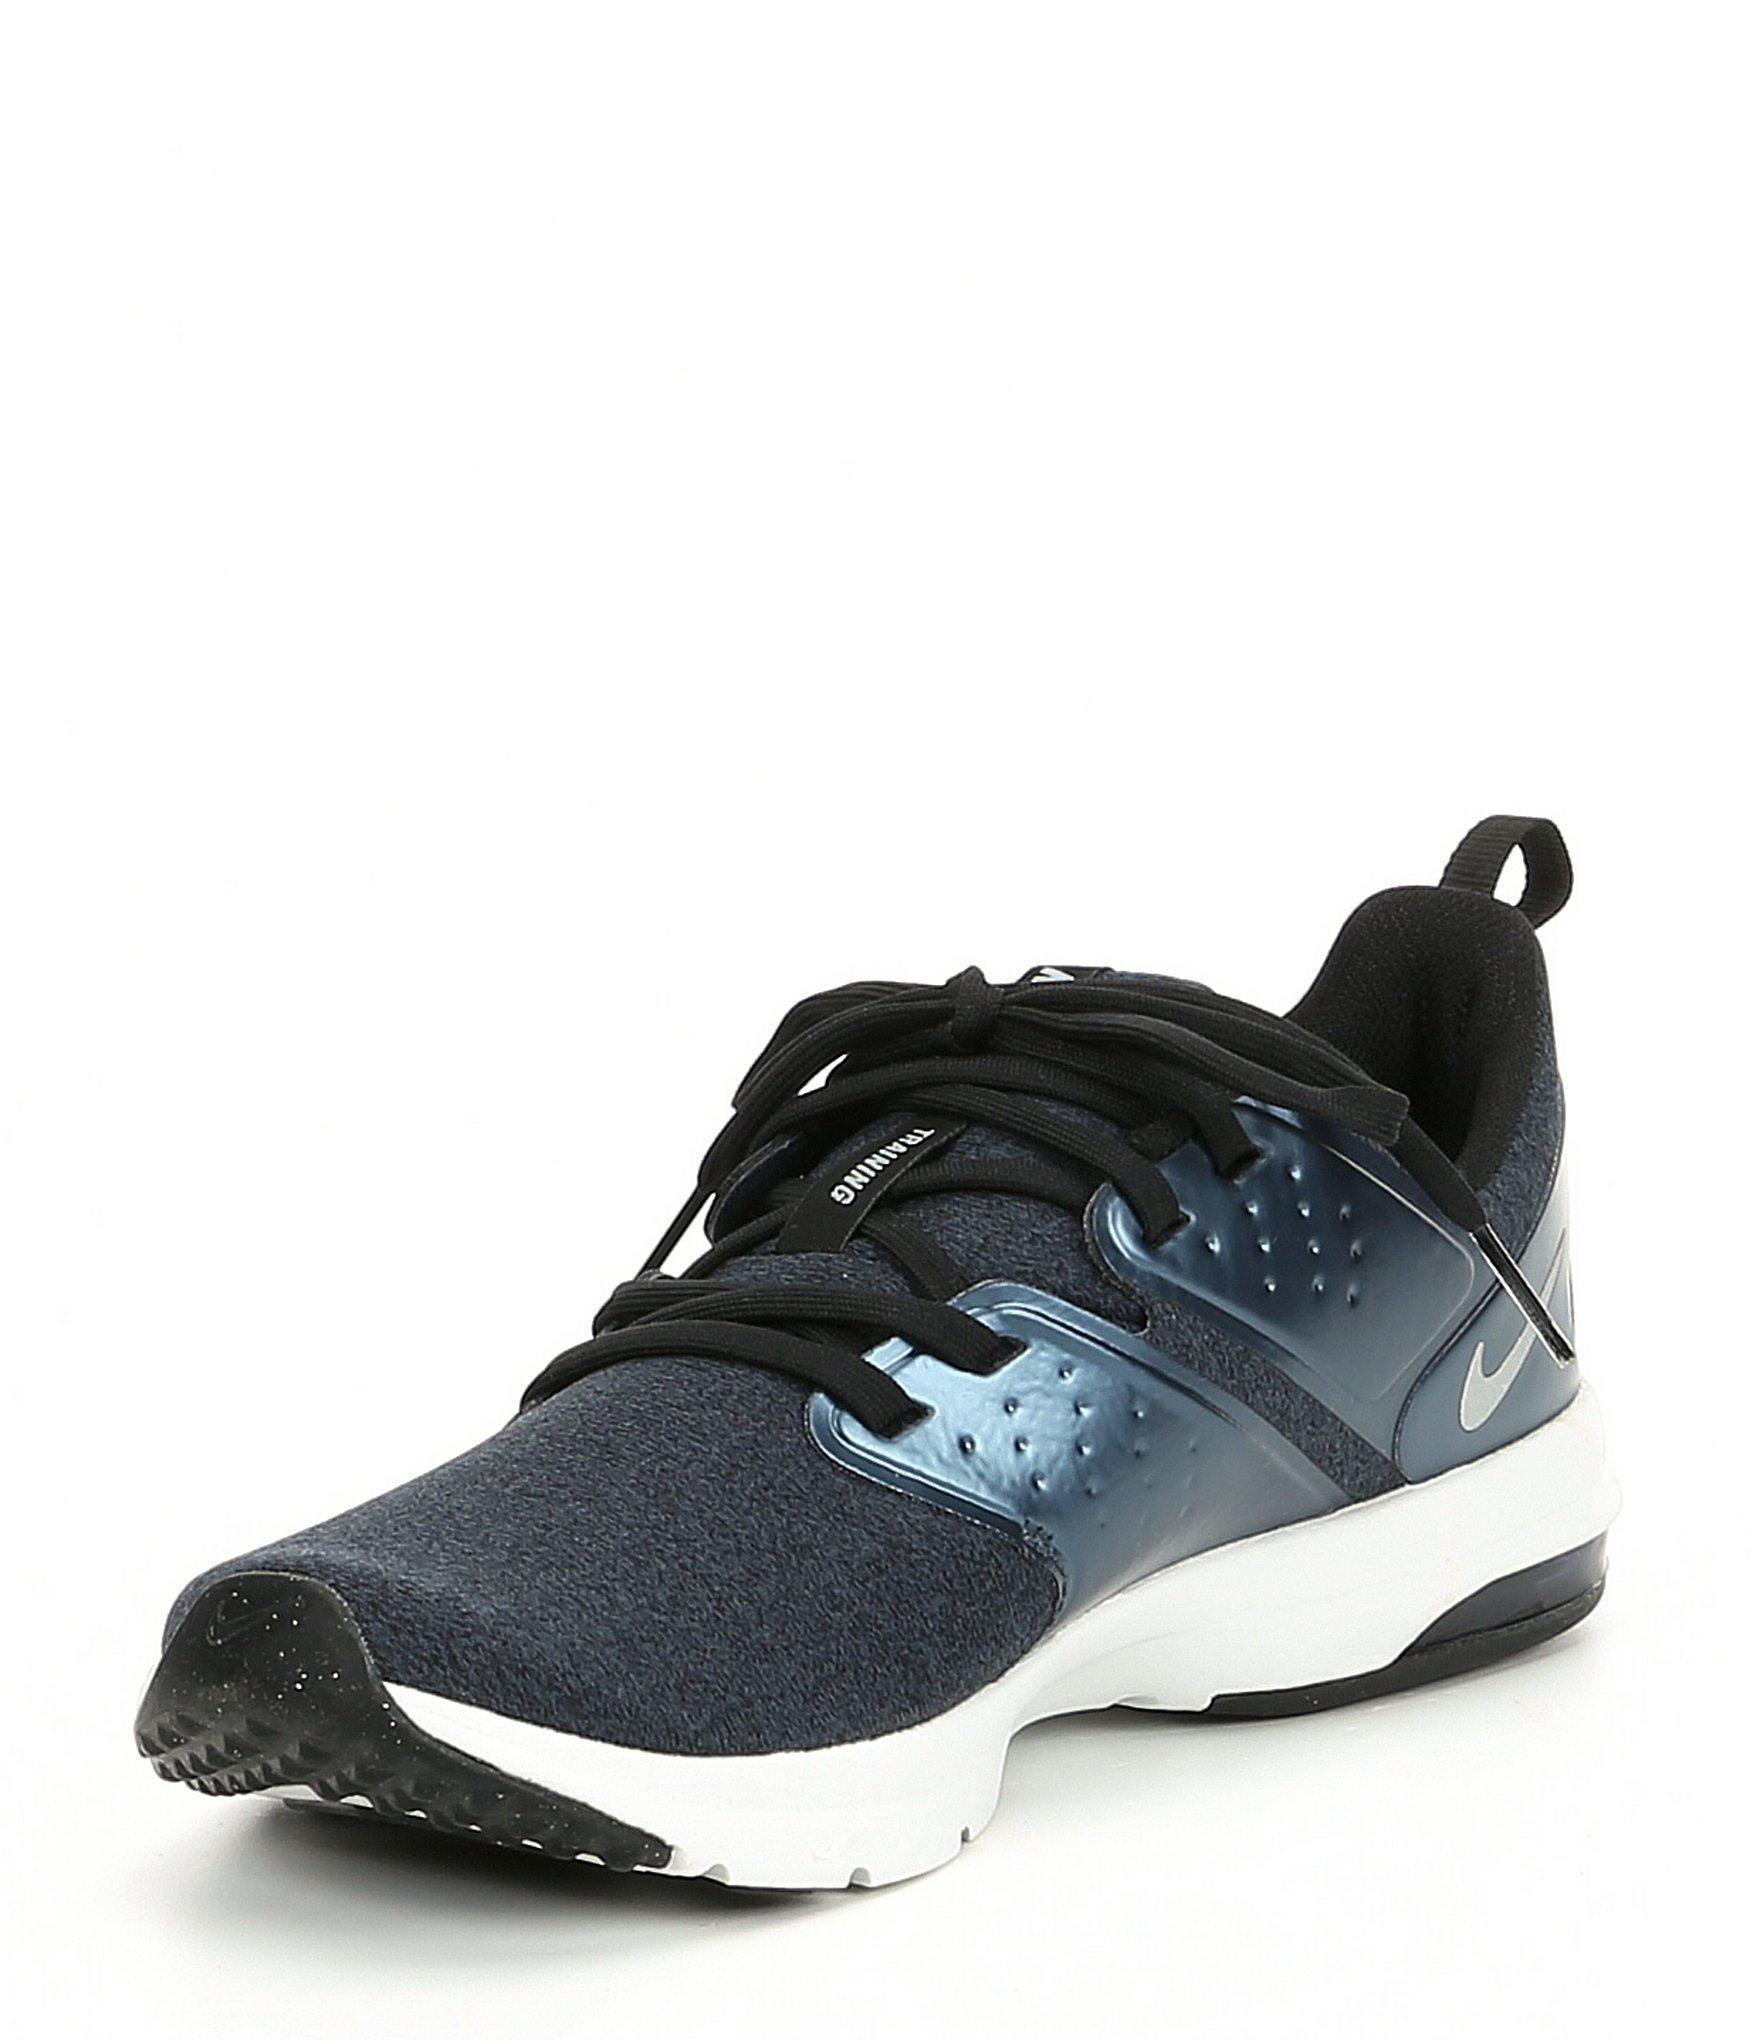 0c1d91e79025ed Lyst - Nike Air Bella Tr Premium Training Shoe in Blue